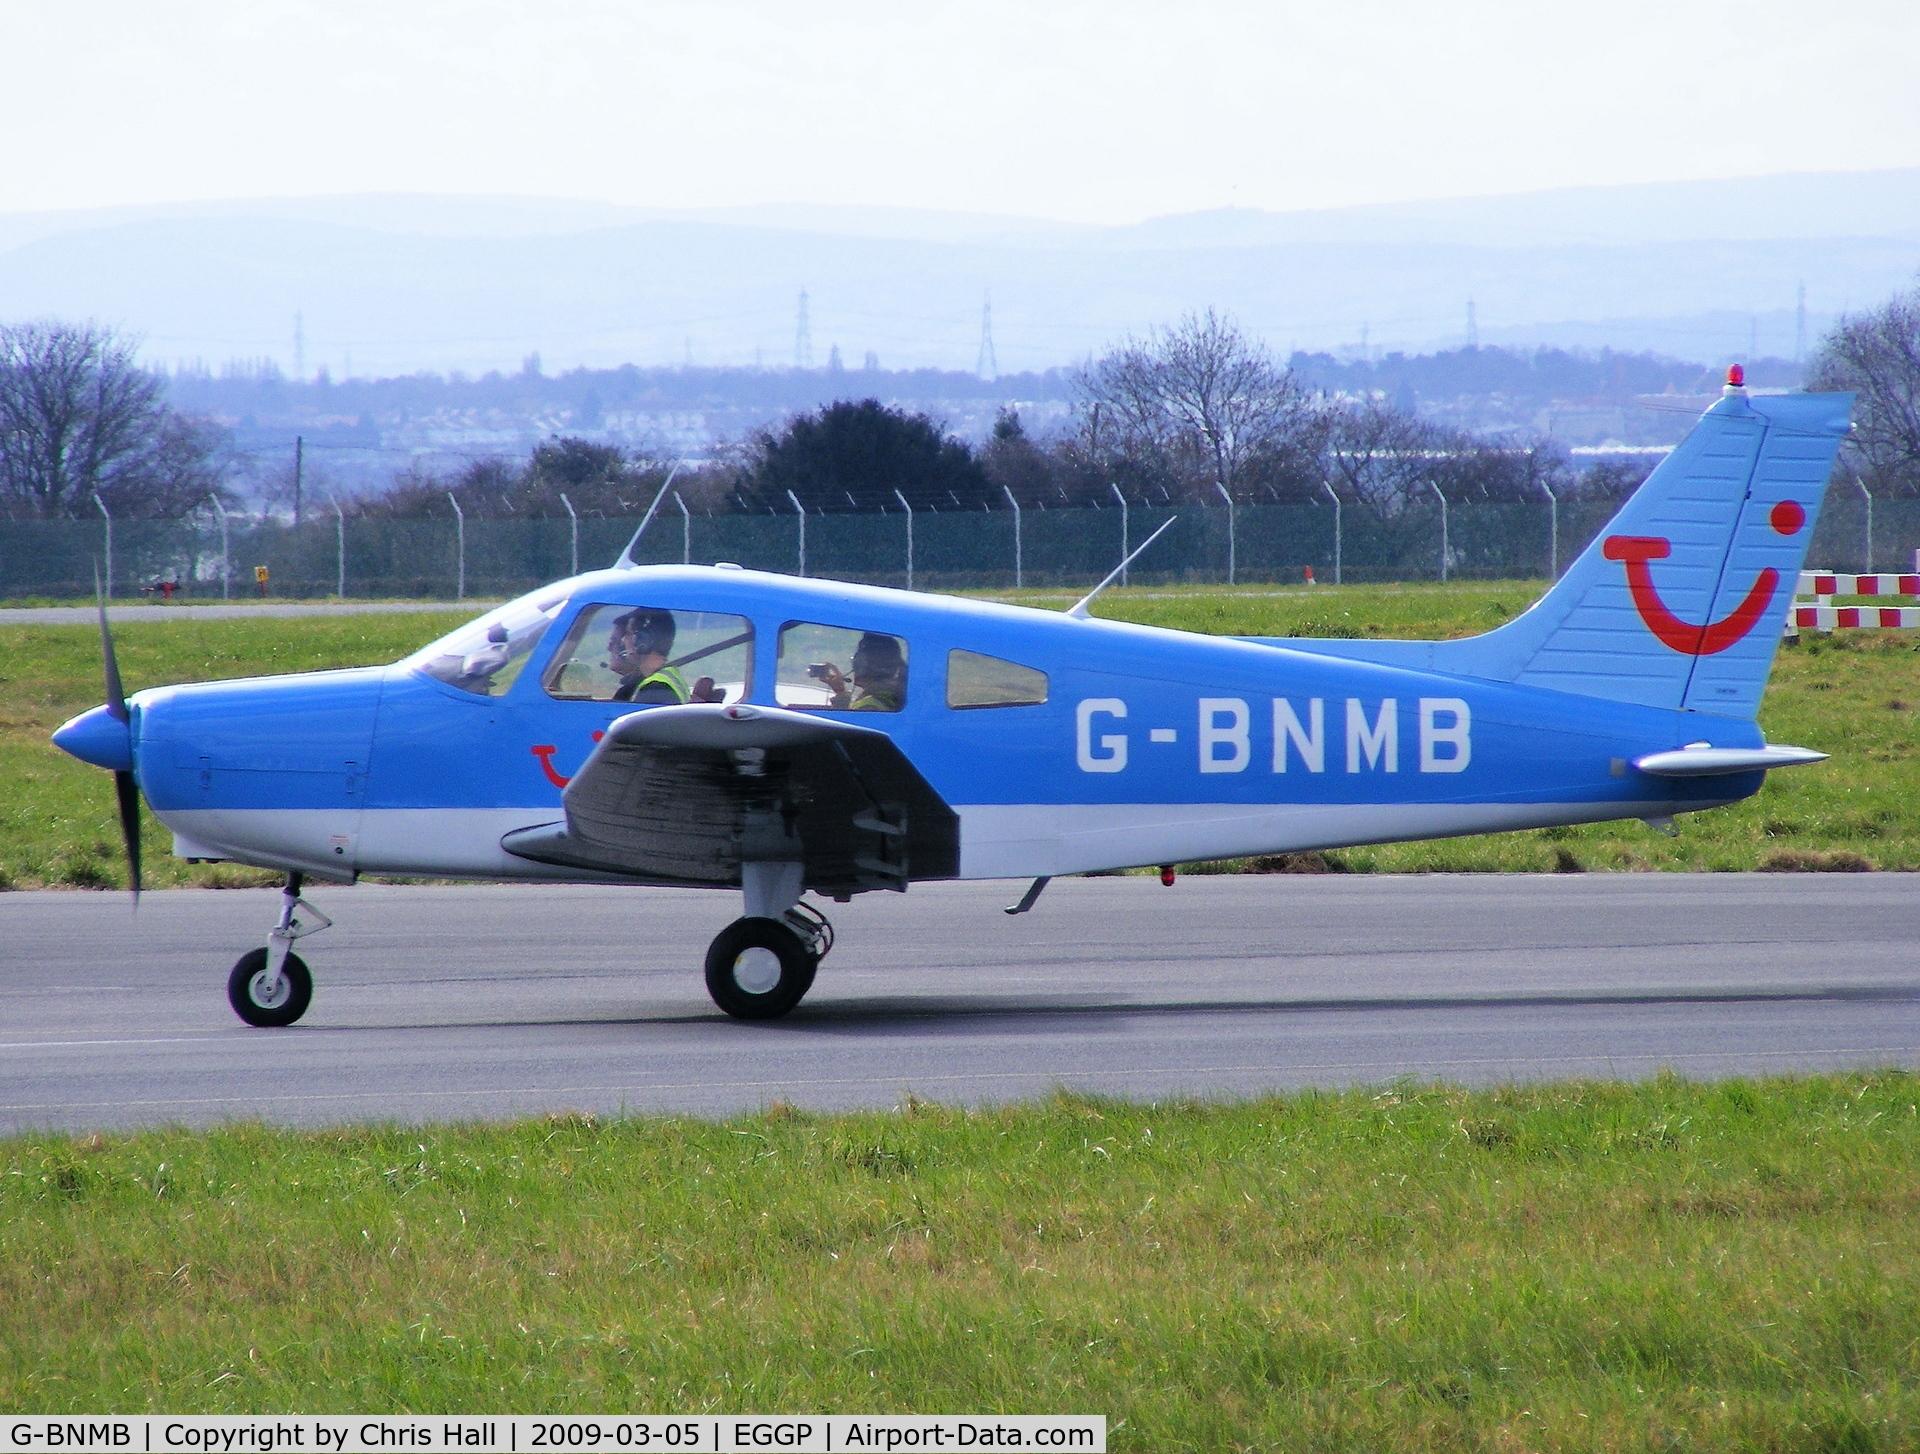 G-BNMB, 1976 Piper PA-28-151 Cherokee Warrior C/N 28-7615369, Thomson flying club, Previous ID: N6826J